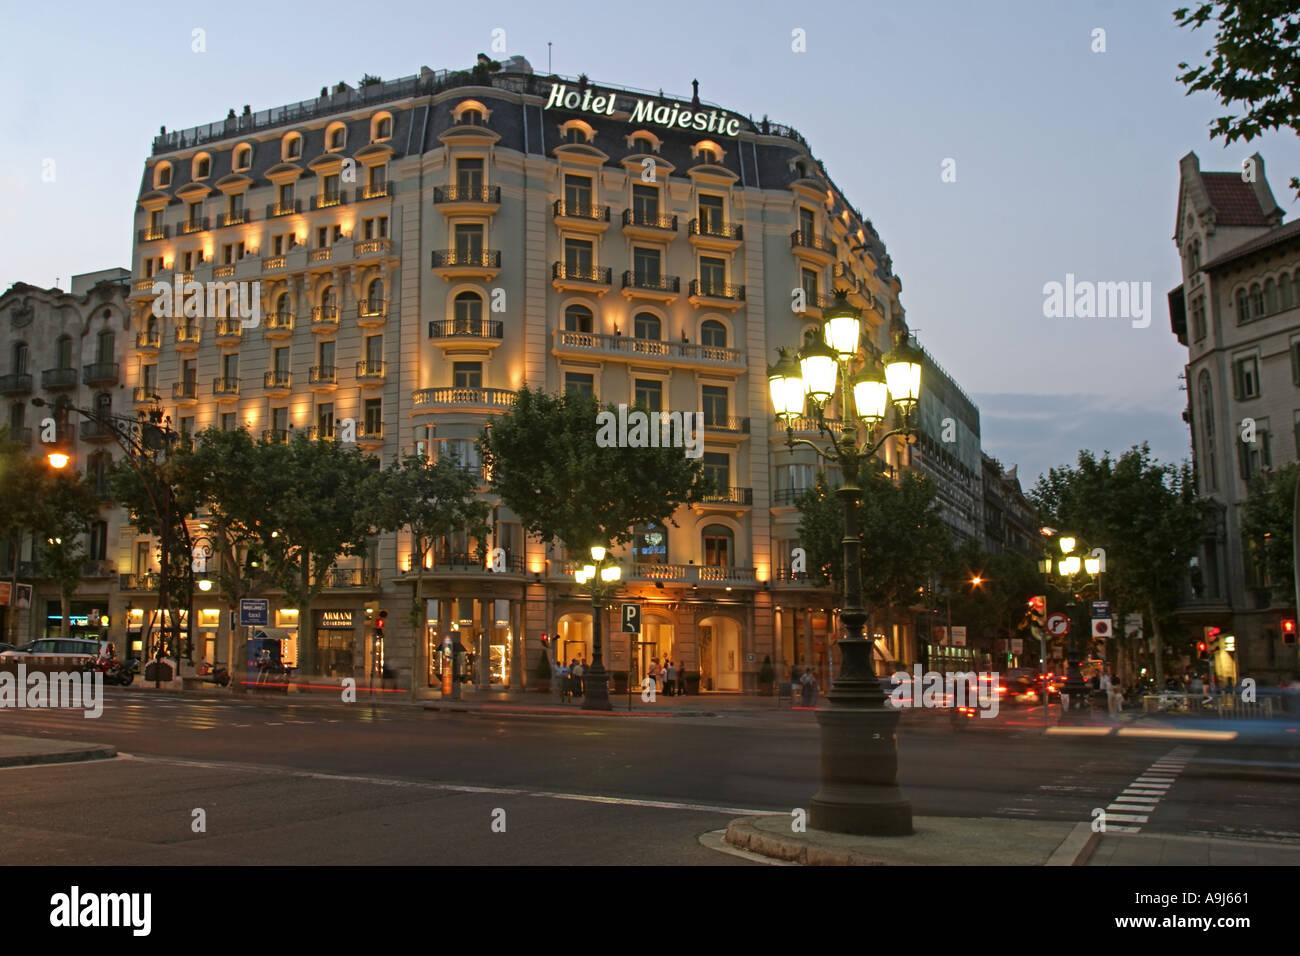 ESP Spanien Barcelona Hotel Majestic Passeig de Gracia  - Stock Image